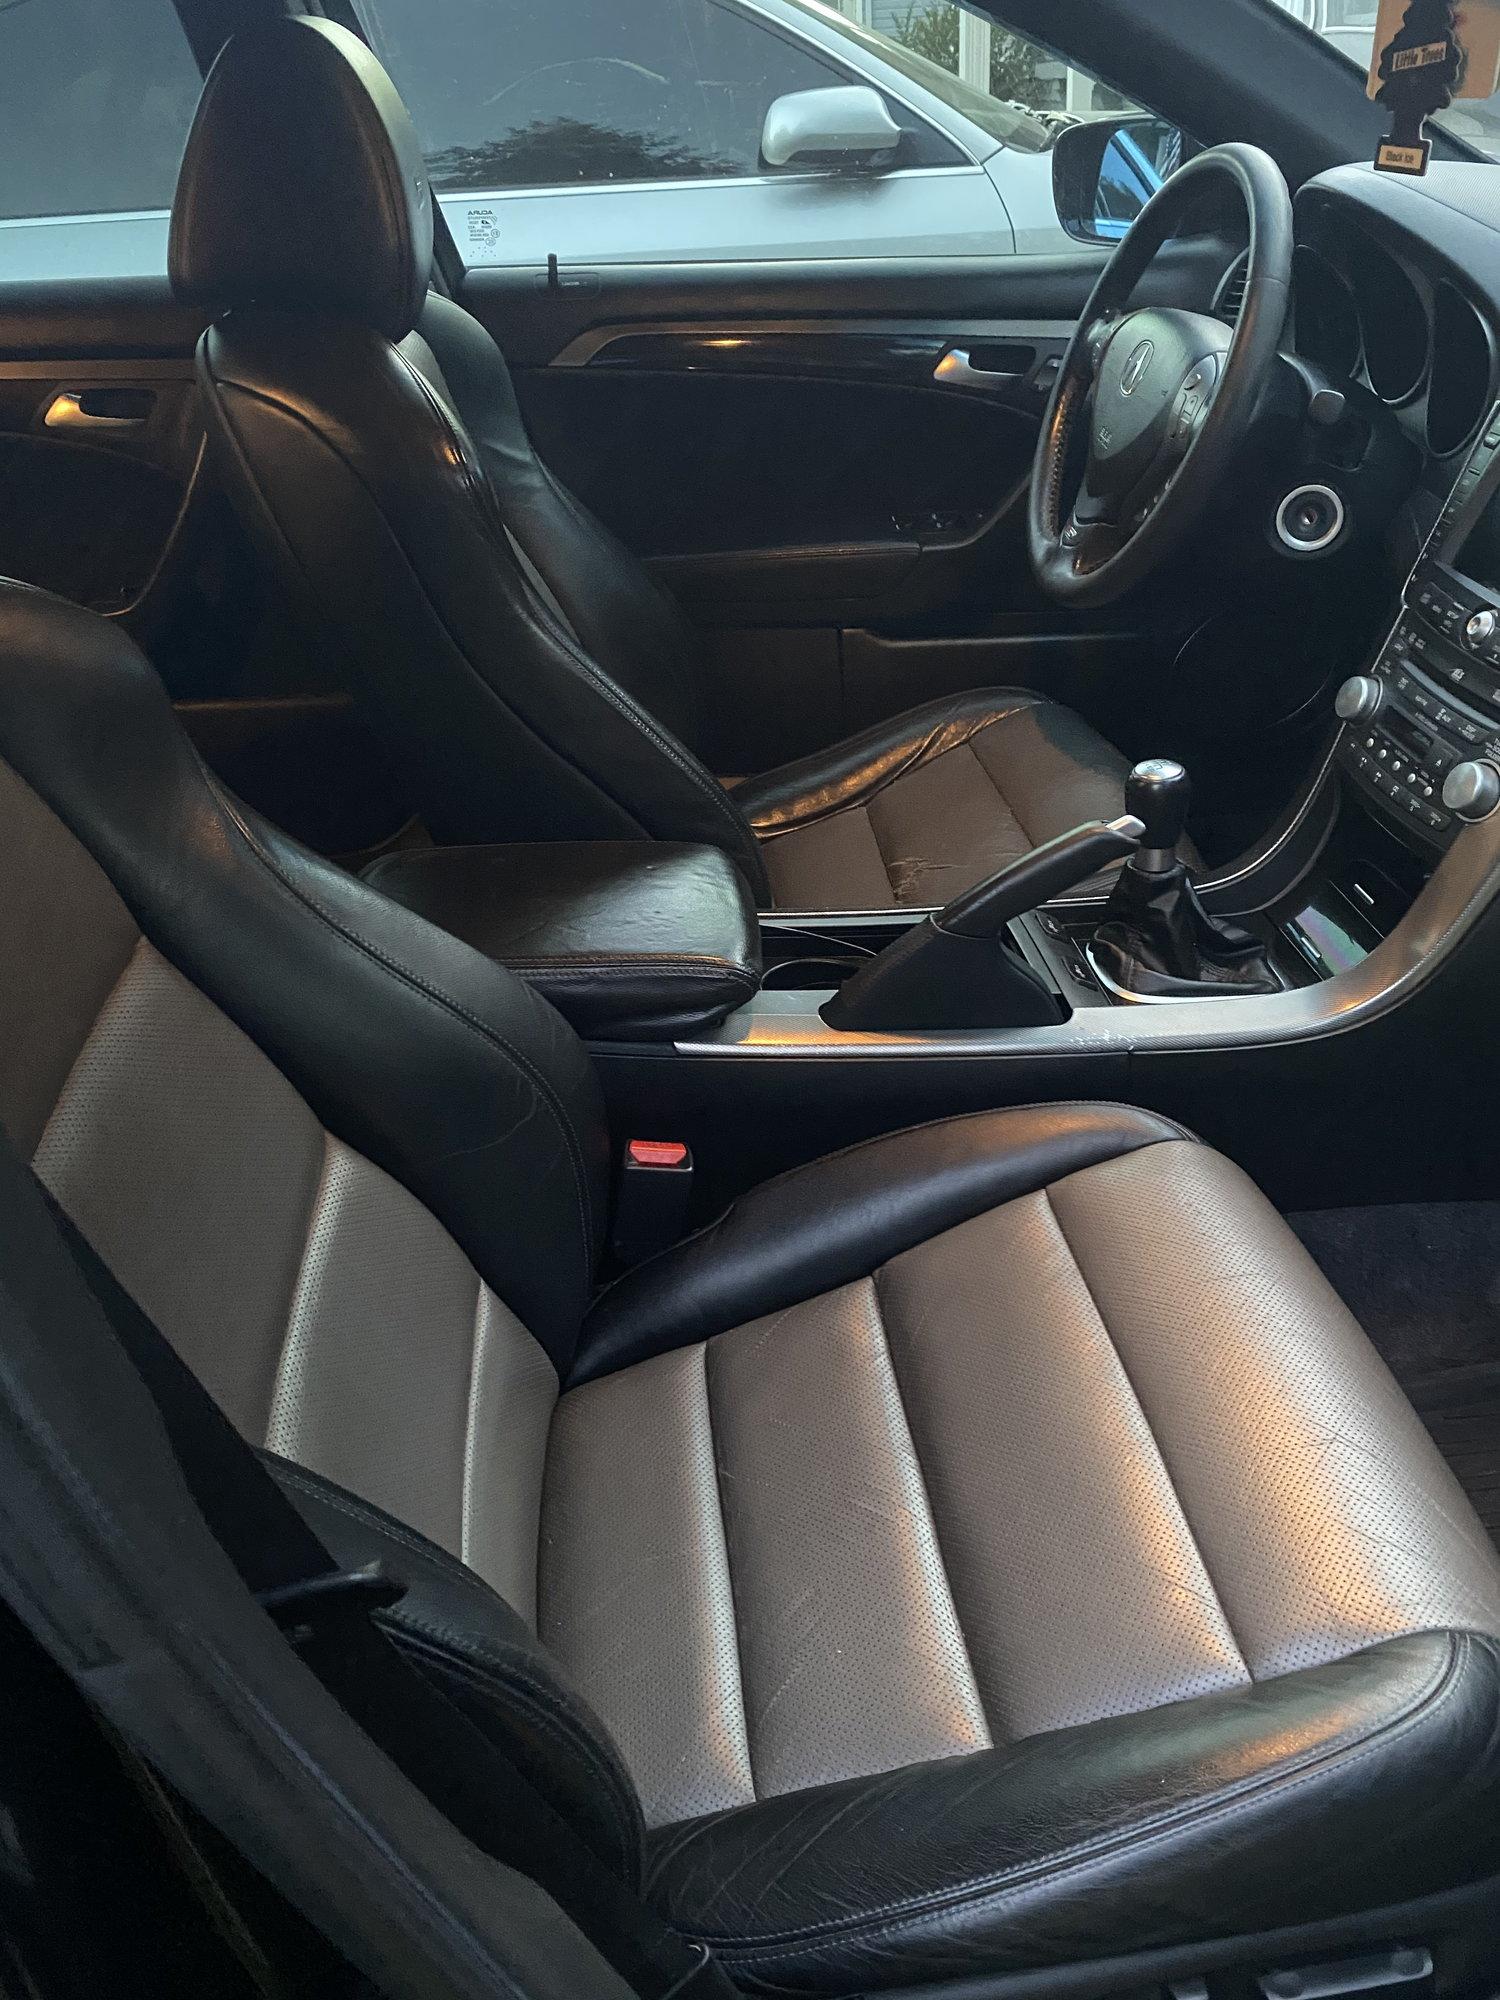 SOLD: 2007 Acura TL Type S 6 Speed Manual - AcuraZine ...